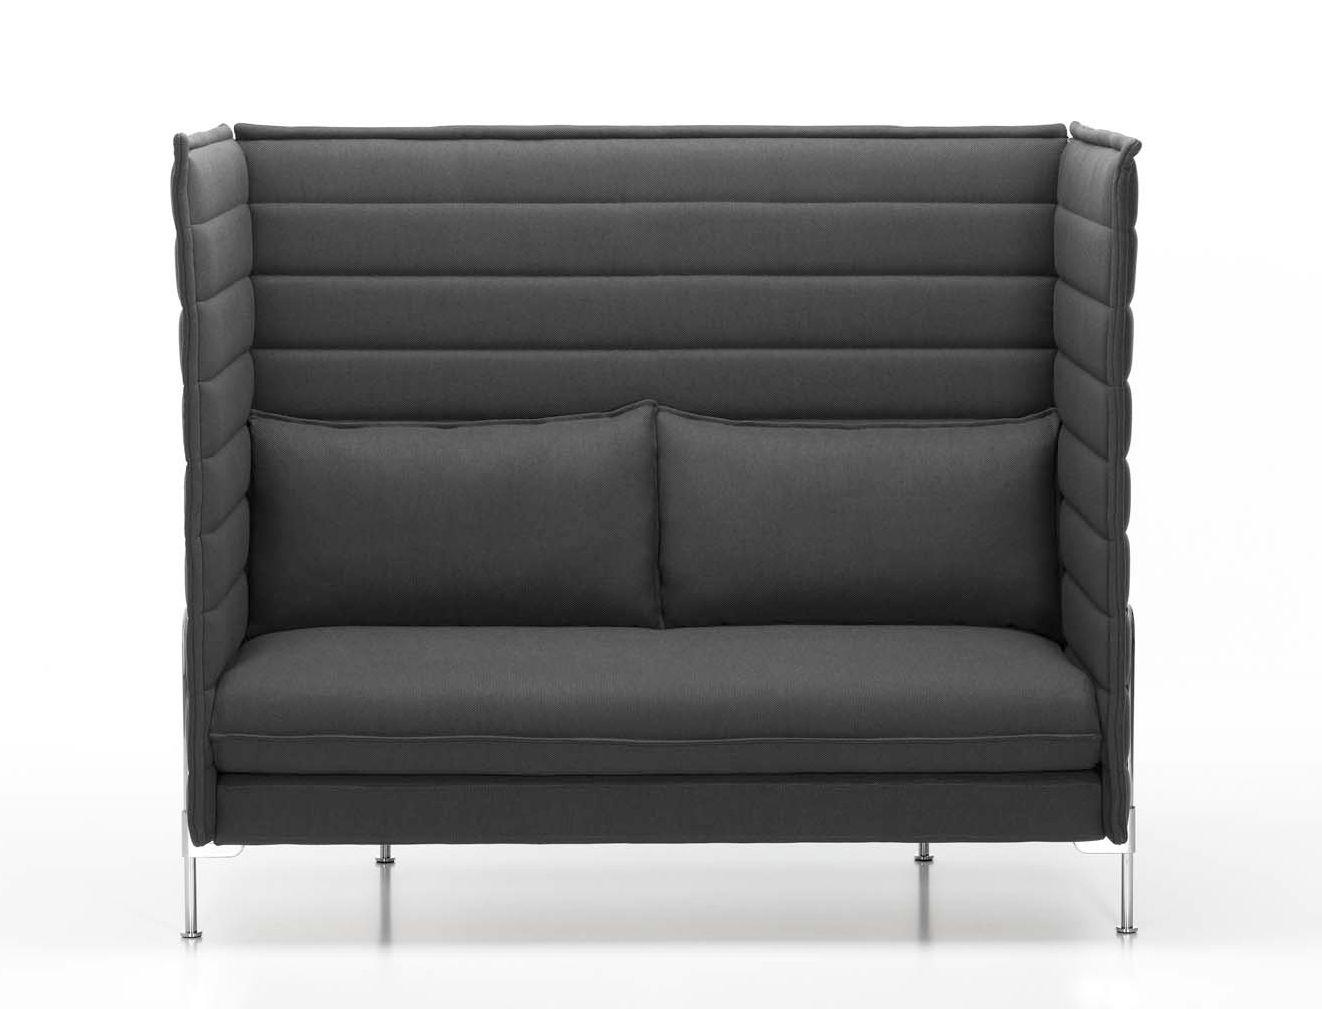 high back sofas 2 seater fabric high back sofa salvador ez. Black Bedroom Furniture Sets. Home Design Ideas